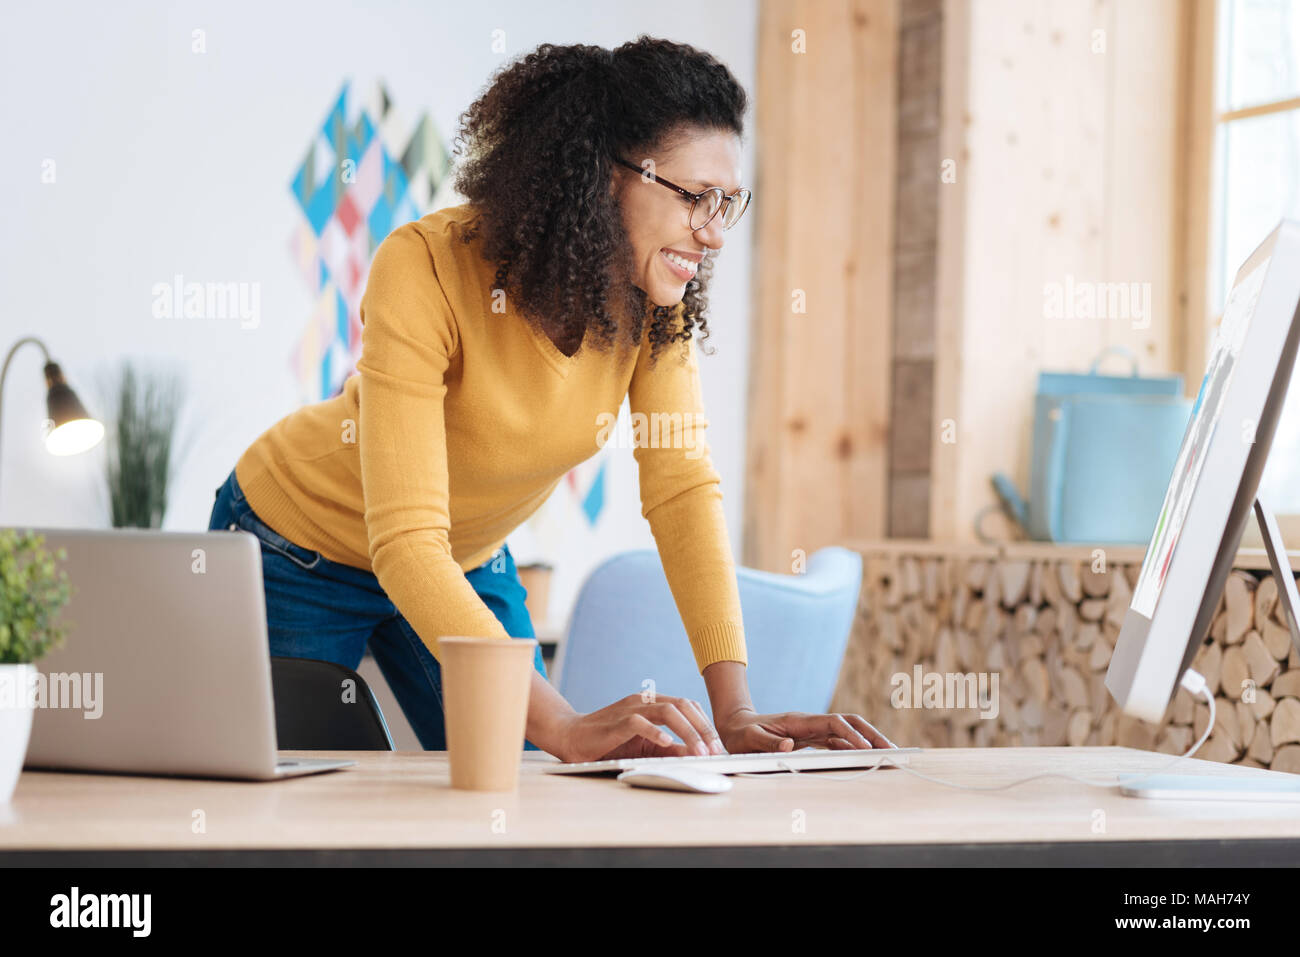 Joyful woman working on her project - Stock Image